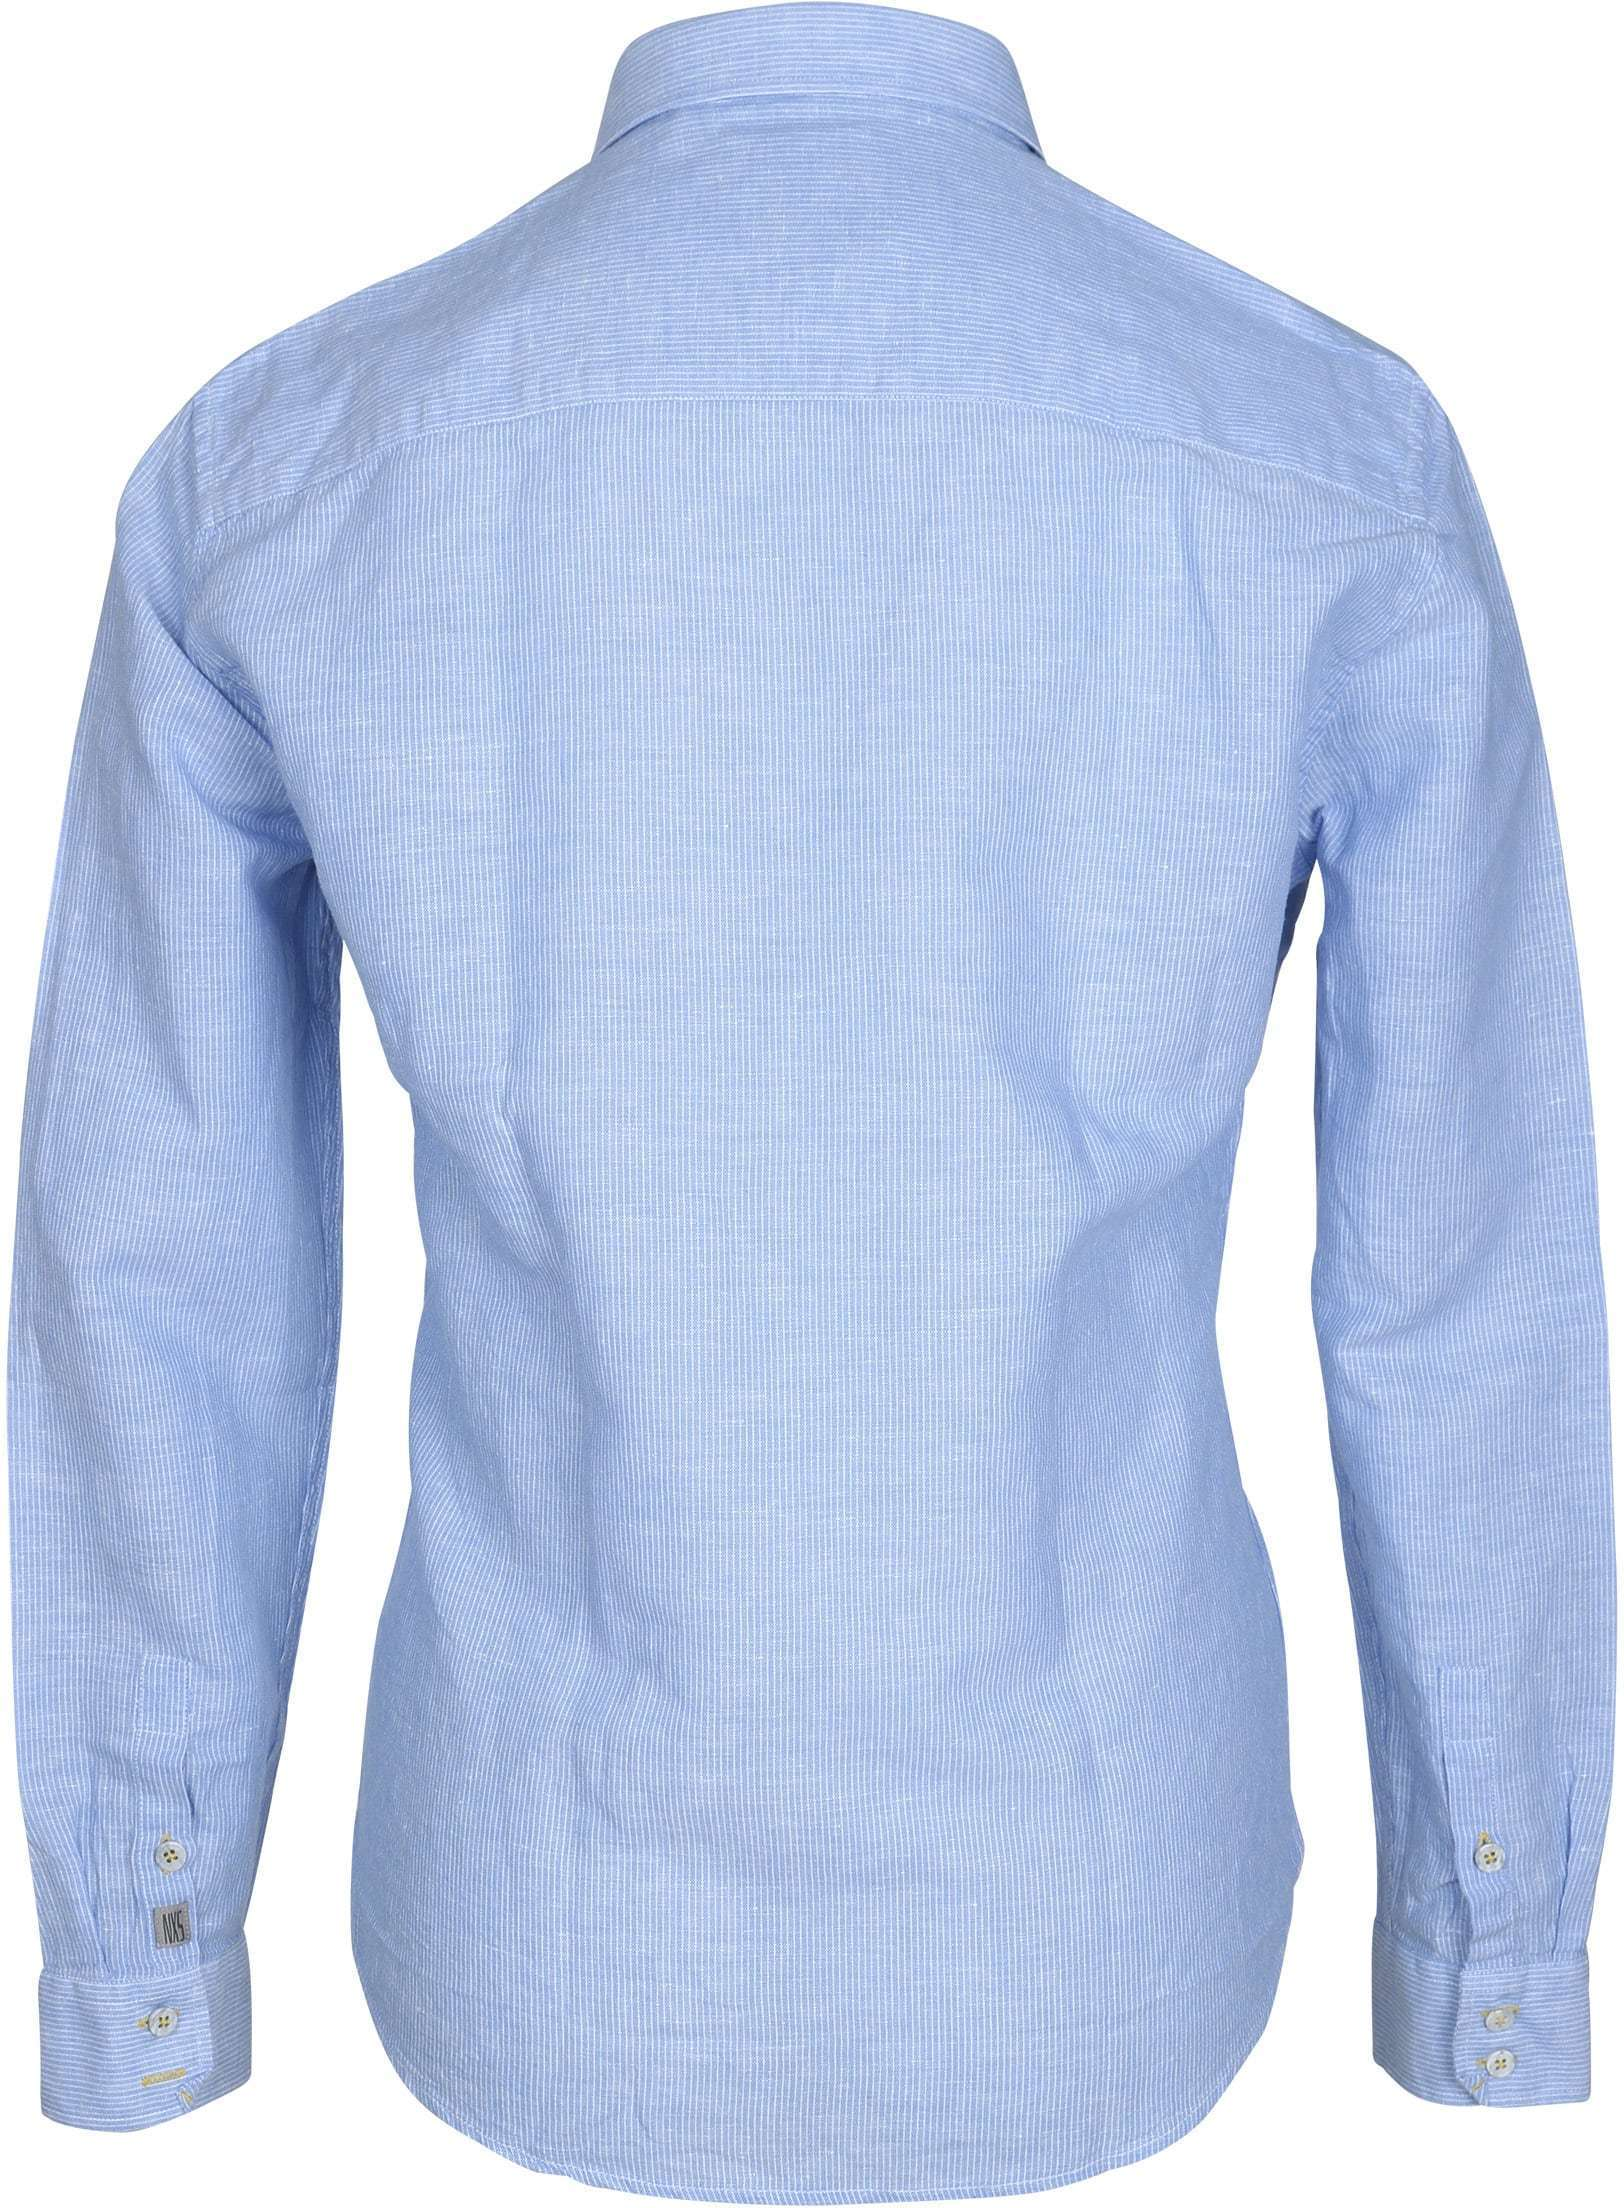 No-Excess Overhemd Blauw Streep foto 3